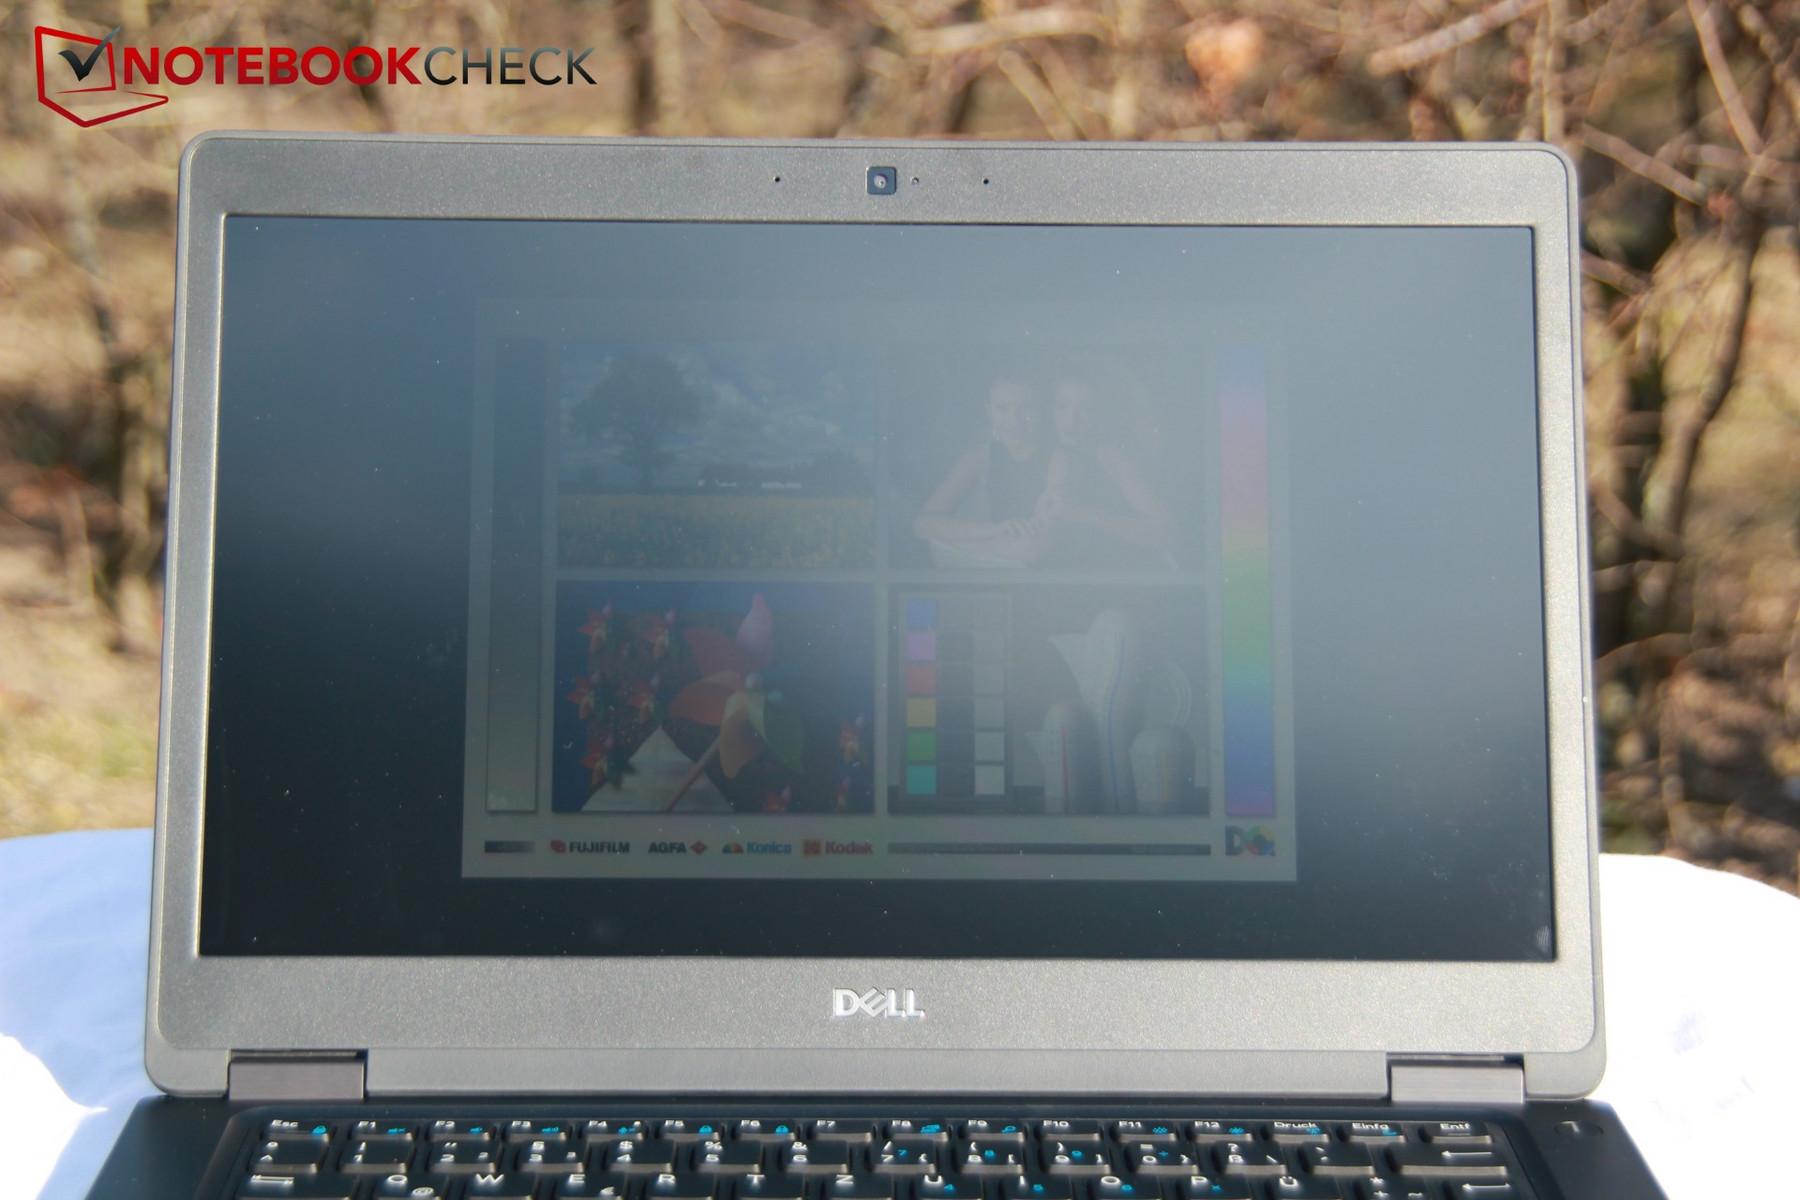 Нормальный классический ноут - ThinkPad vs Latitude/Precision vs